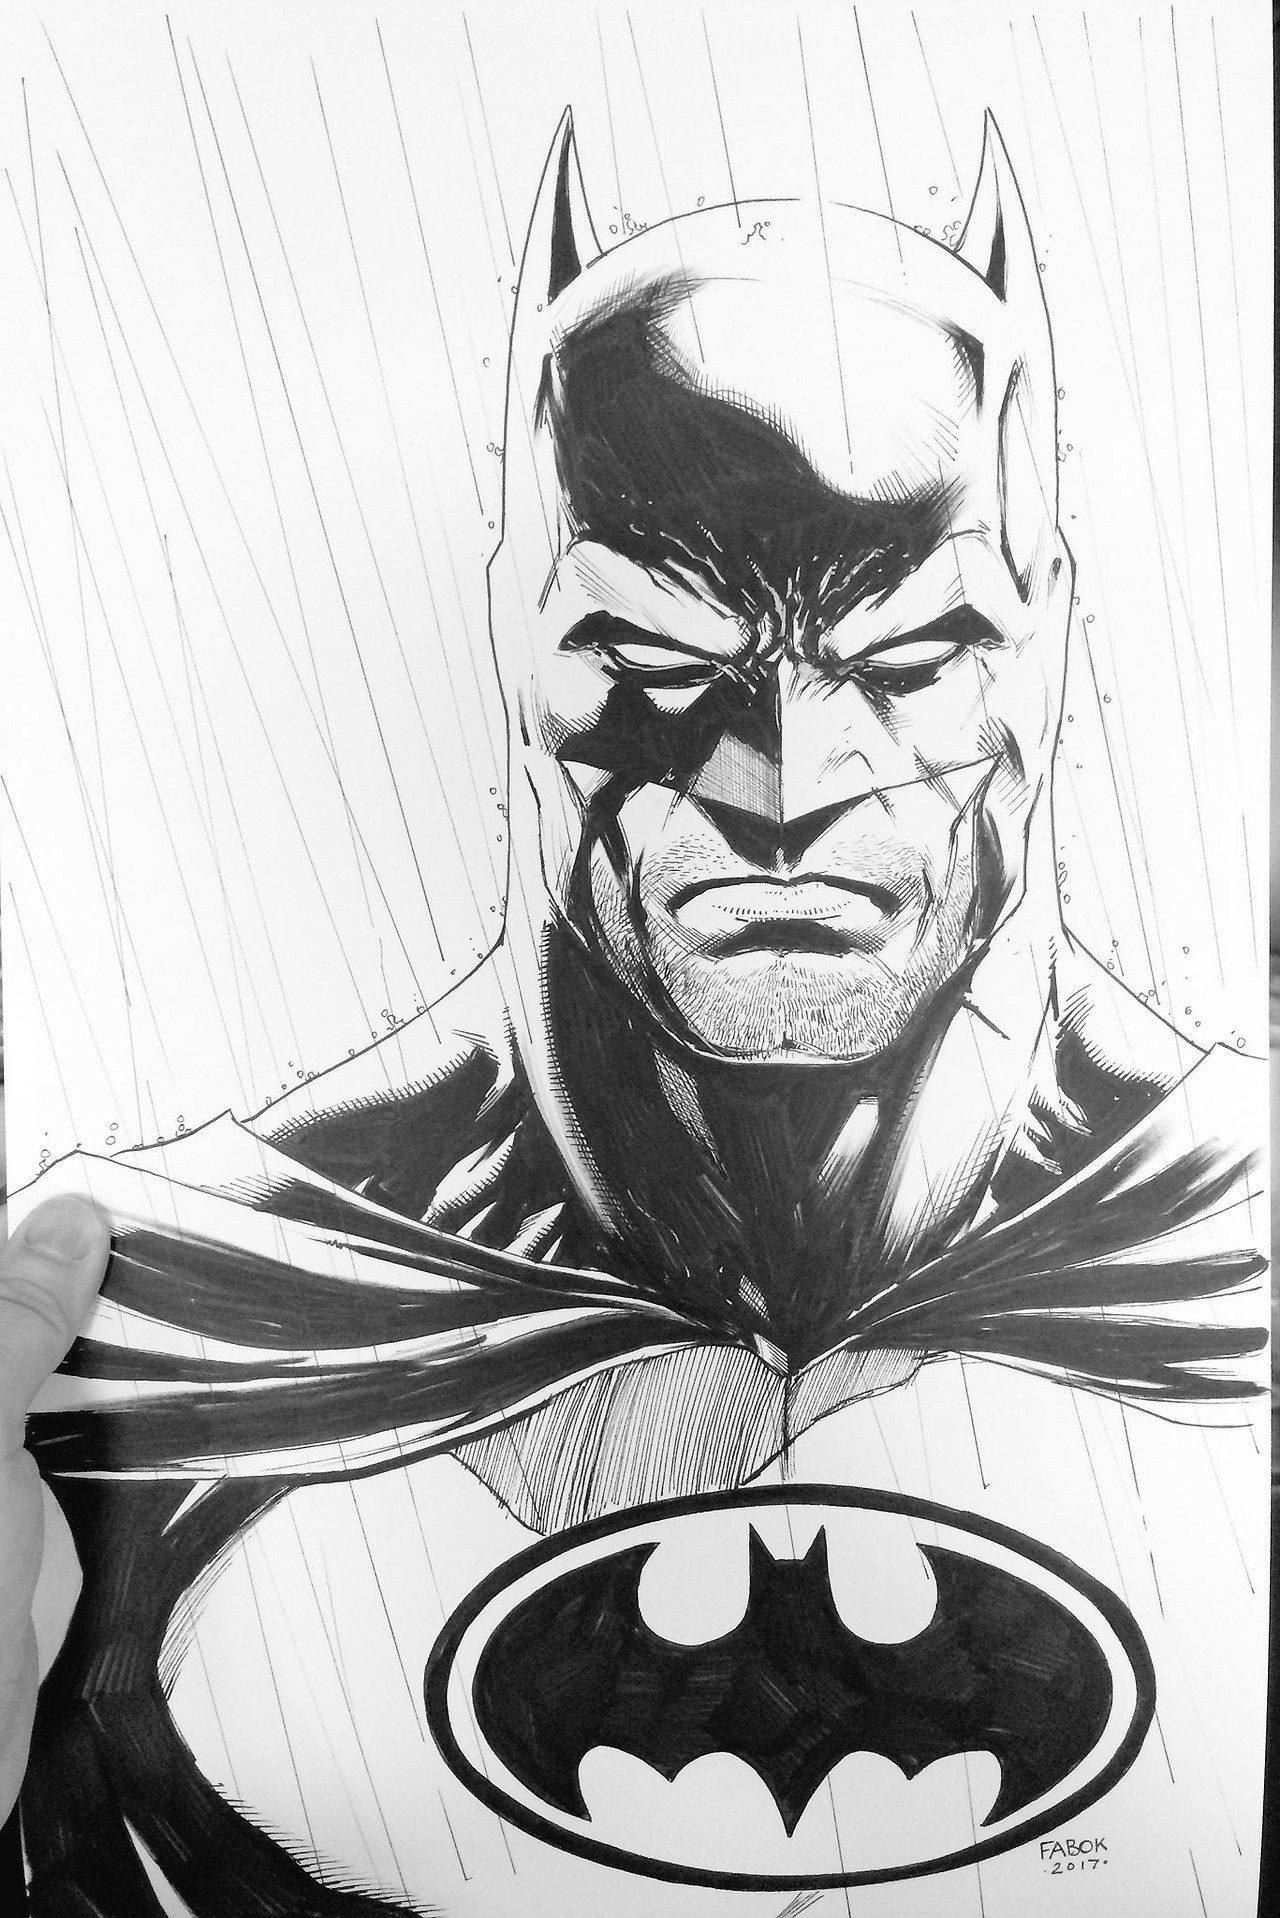 Batman Jason Fabok Bybatman By Jason Fabok Batman Drawing Batman Comic Wallpaper Batman Art